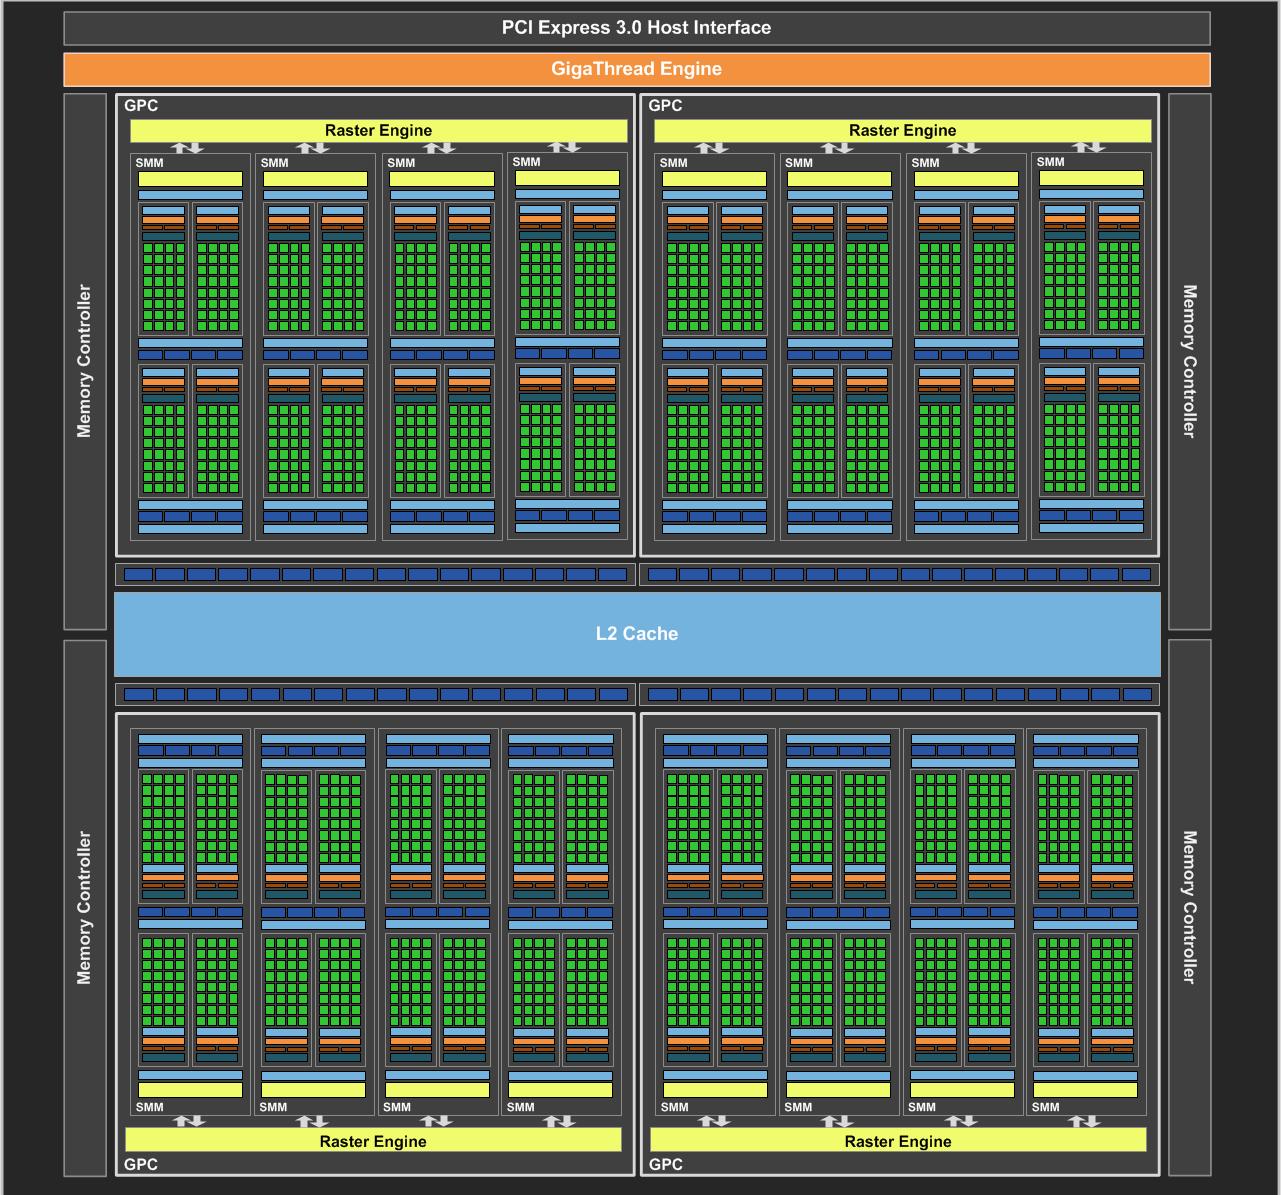 geforce-gtx-980-block-diagram-final.png